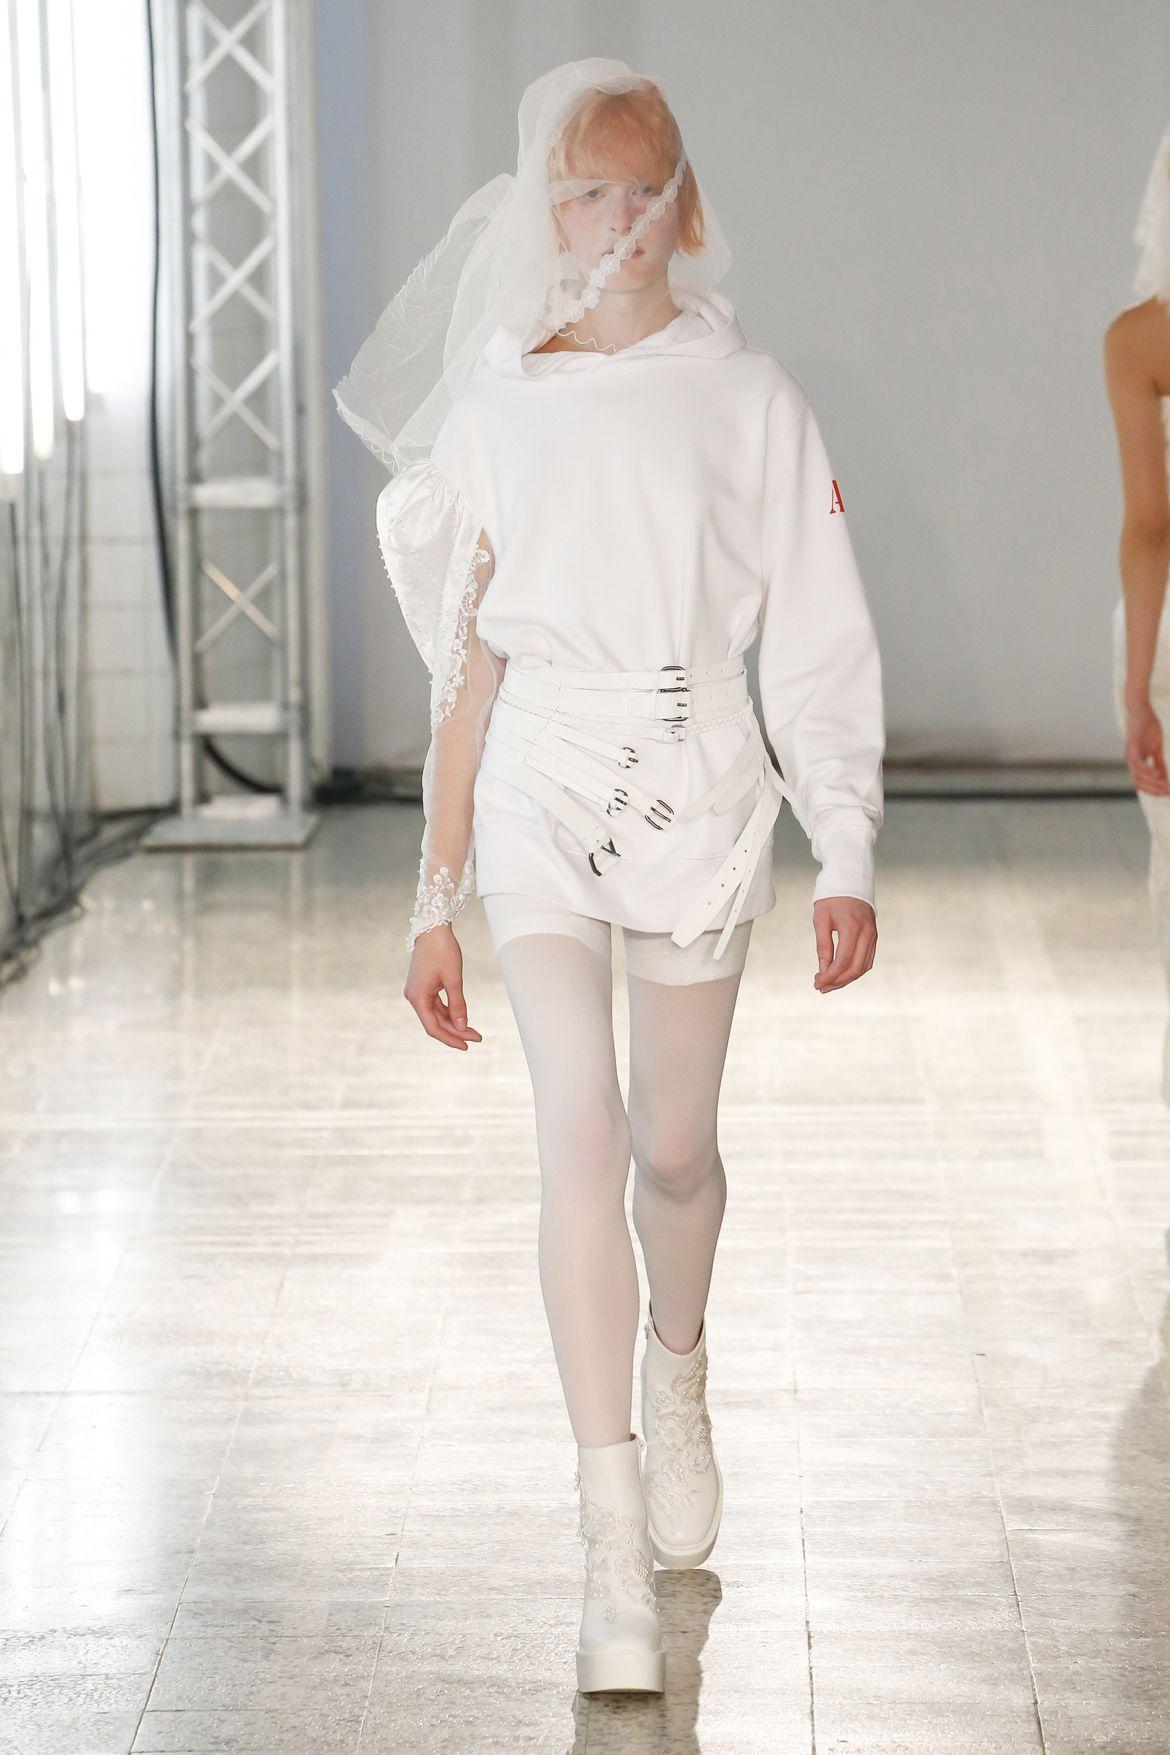 Ss19 Runway By Designer Af Vandevorst Fashion Show Fashion Ready To Wear